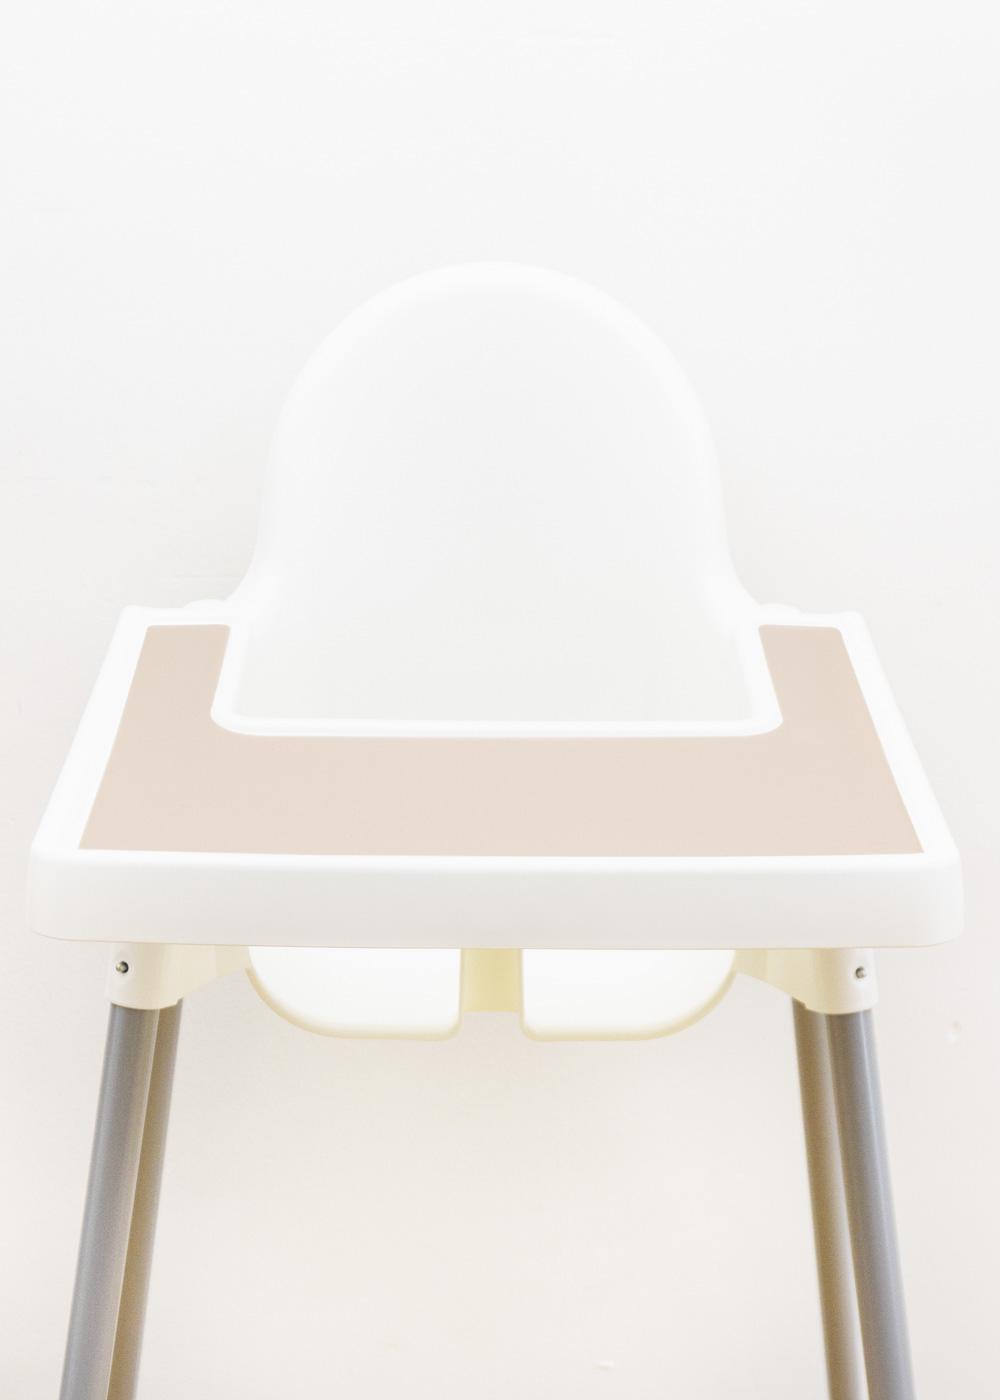 Silikonmatte Ikea Antilop Hochstuhl Klecka Mat creme